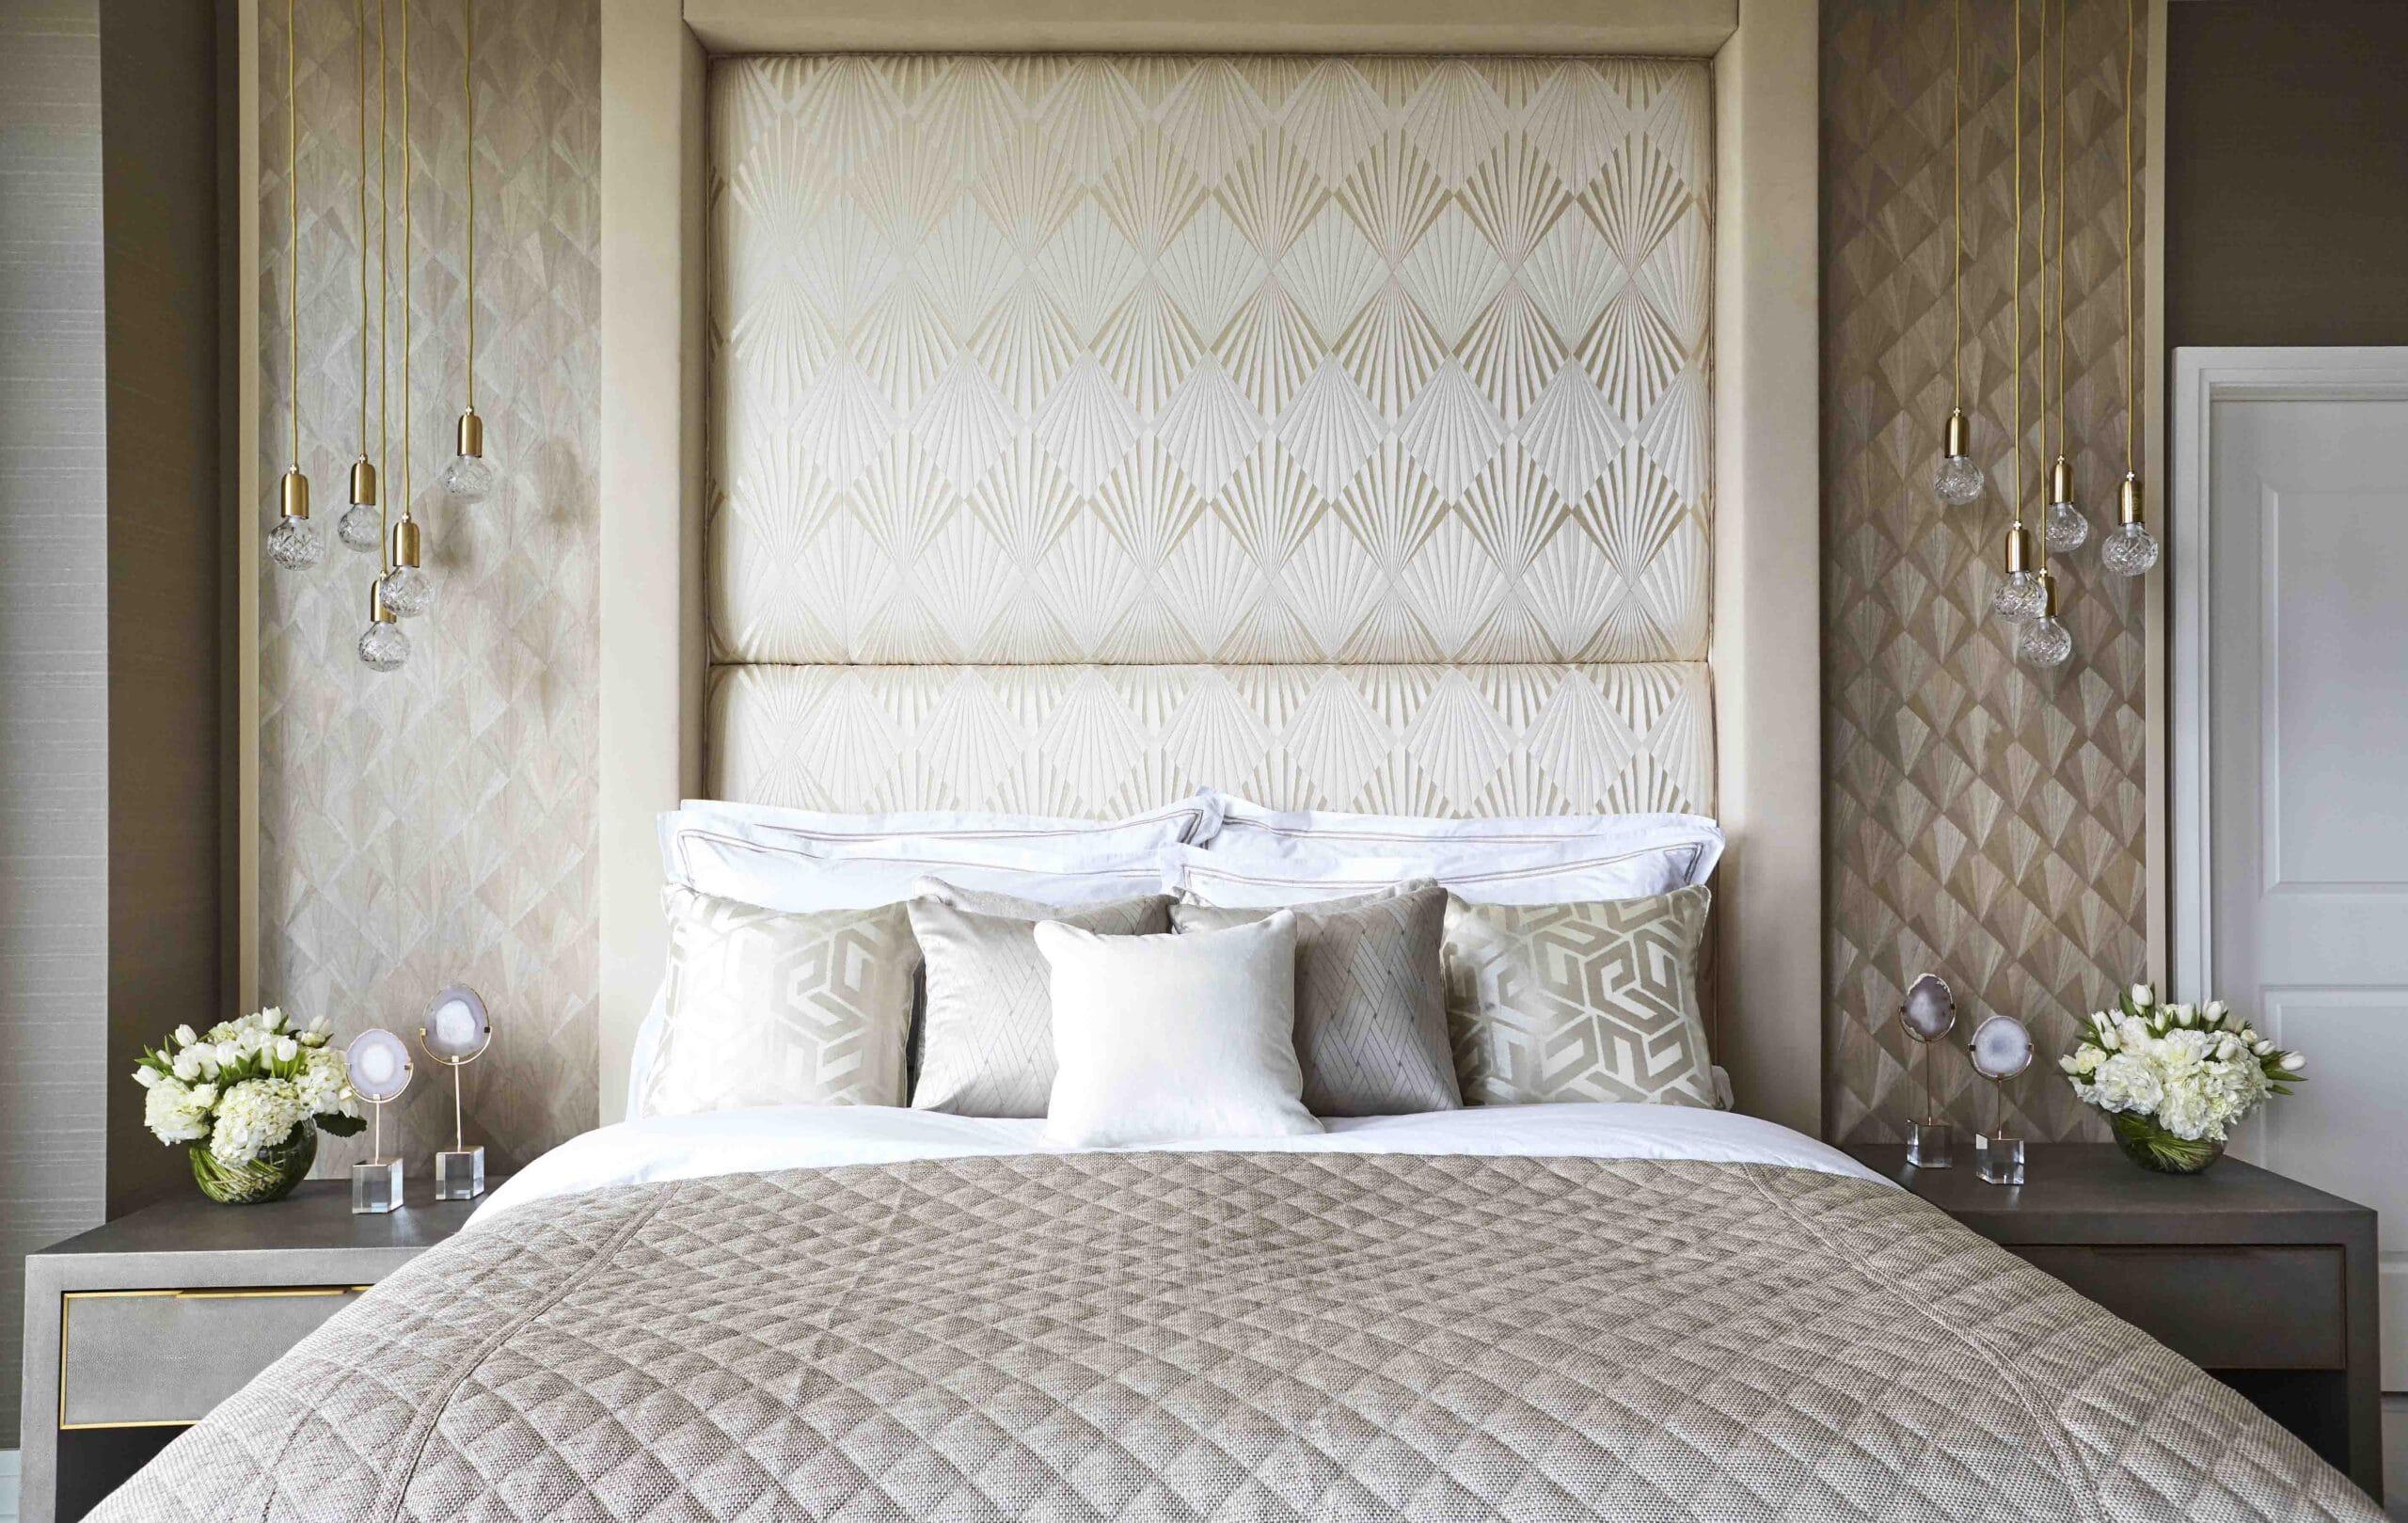 Bedroom in washington interior design project